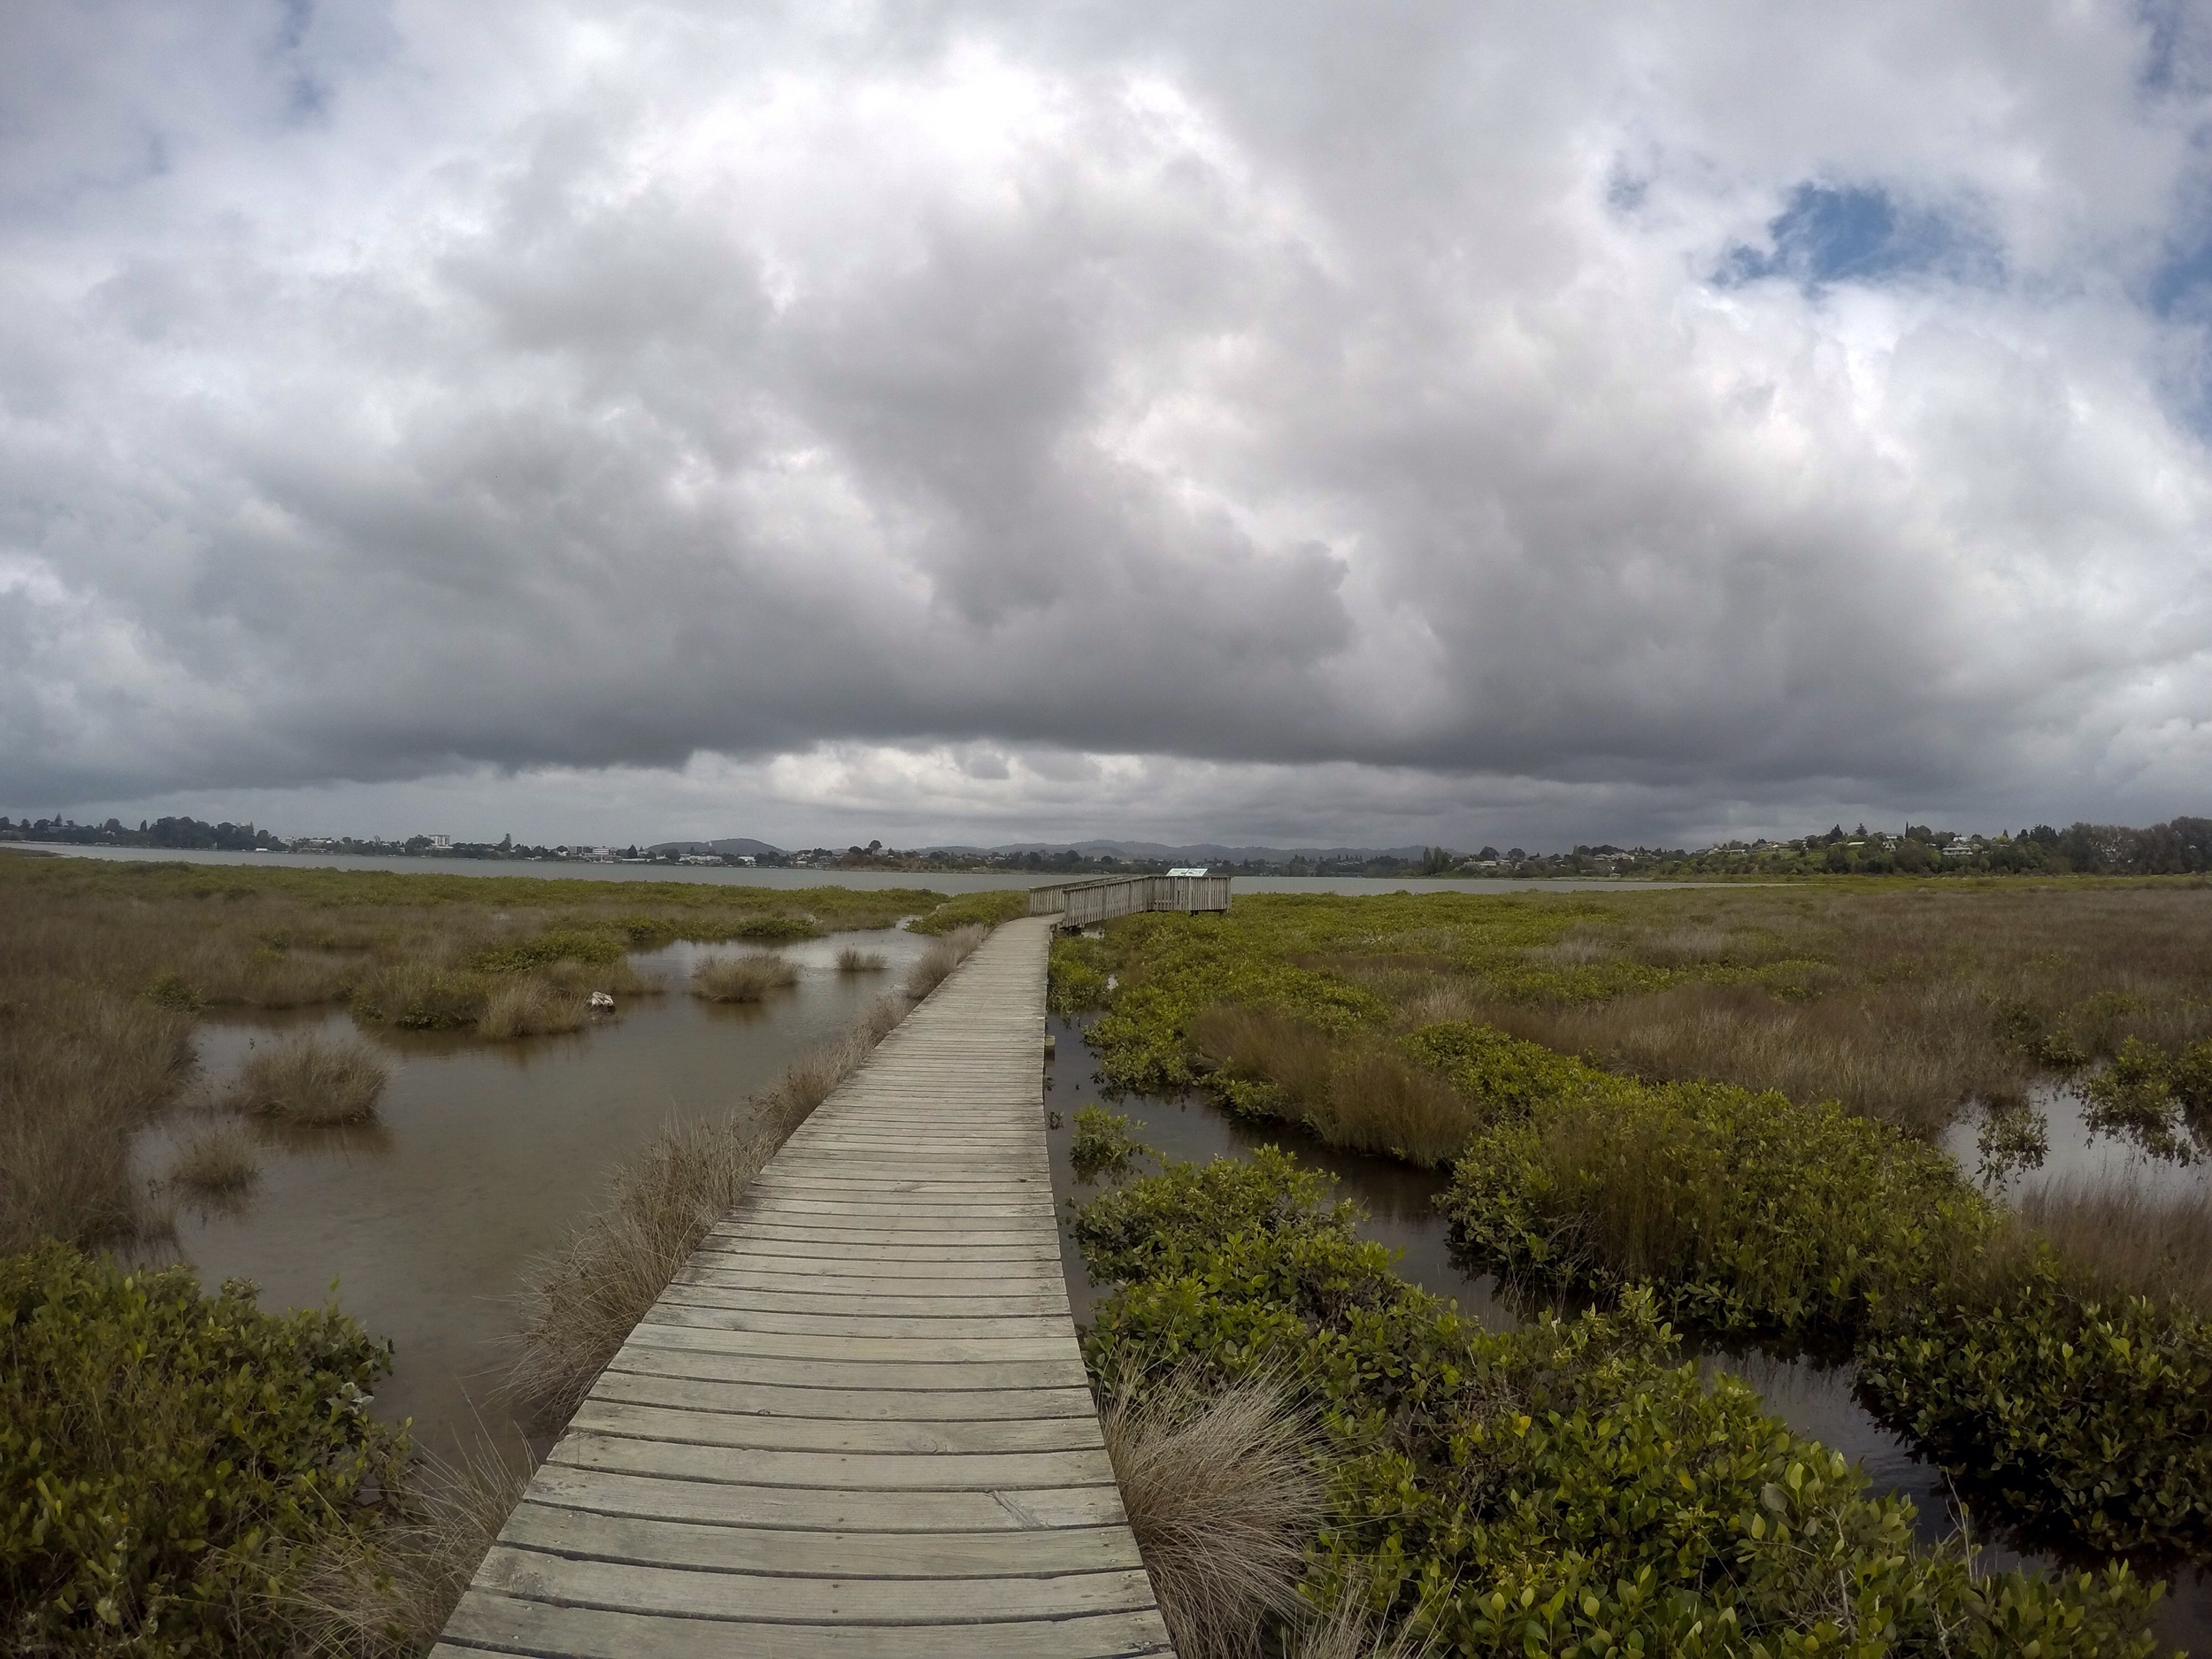 Wetland buffer zone. Tauranga, New Zealand.